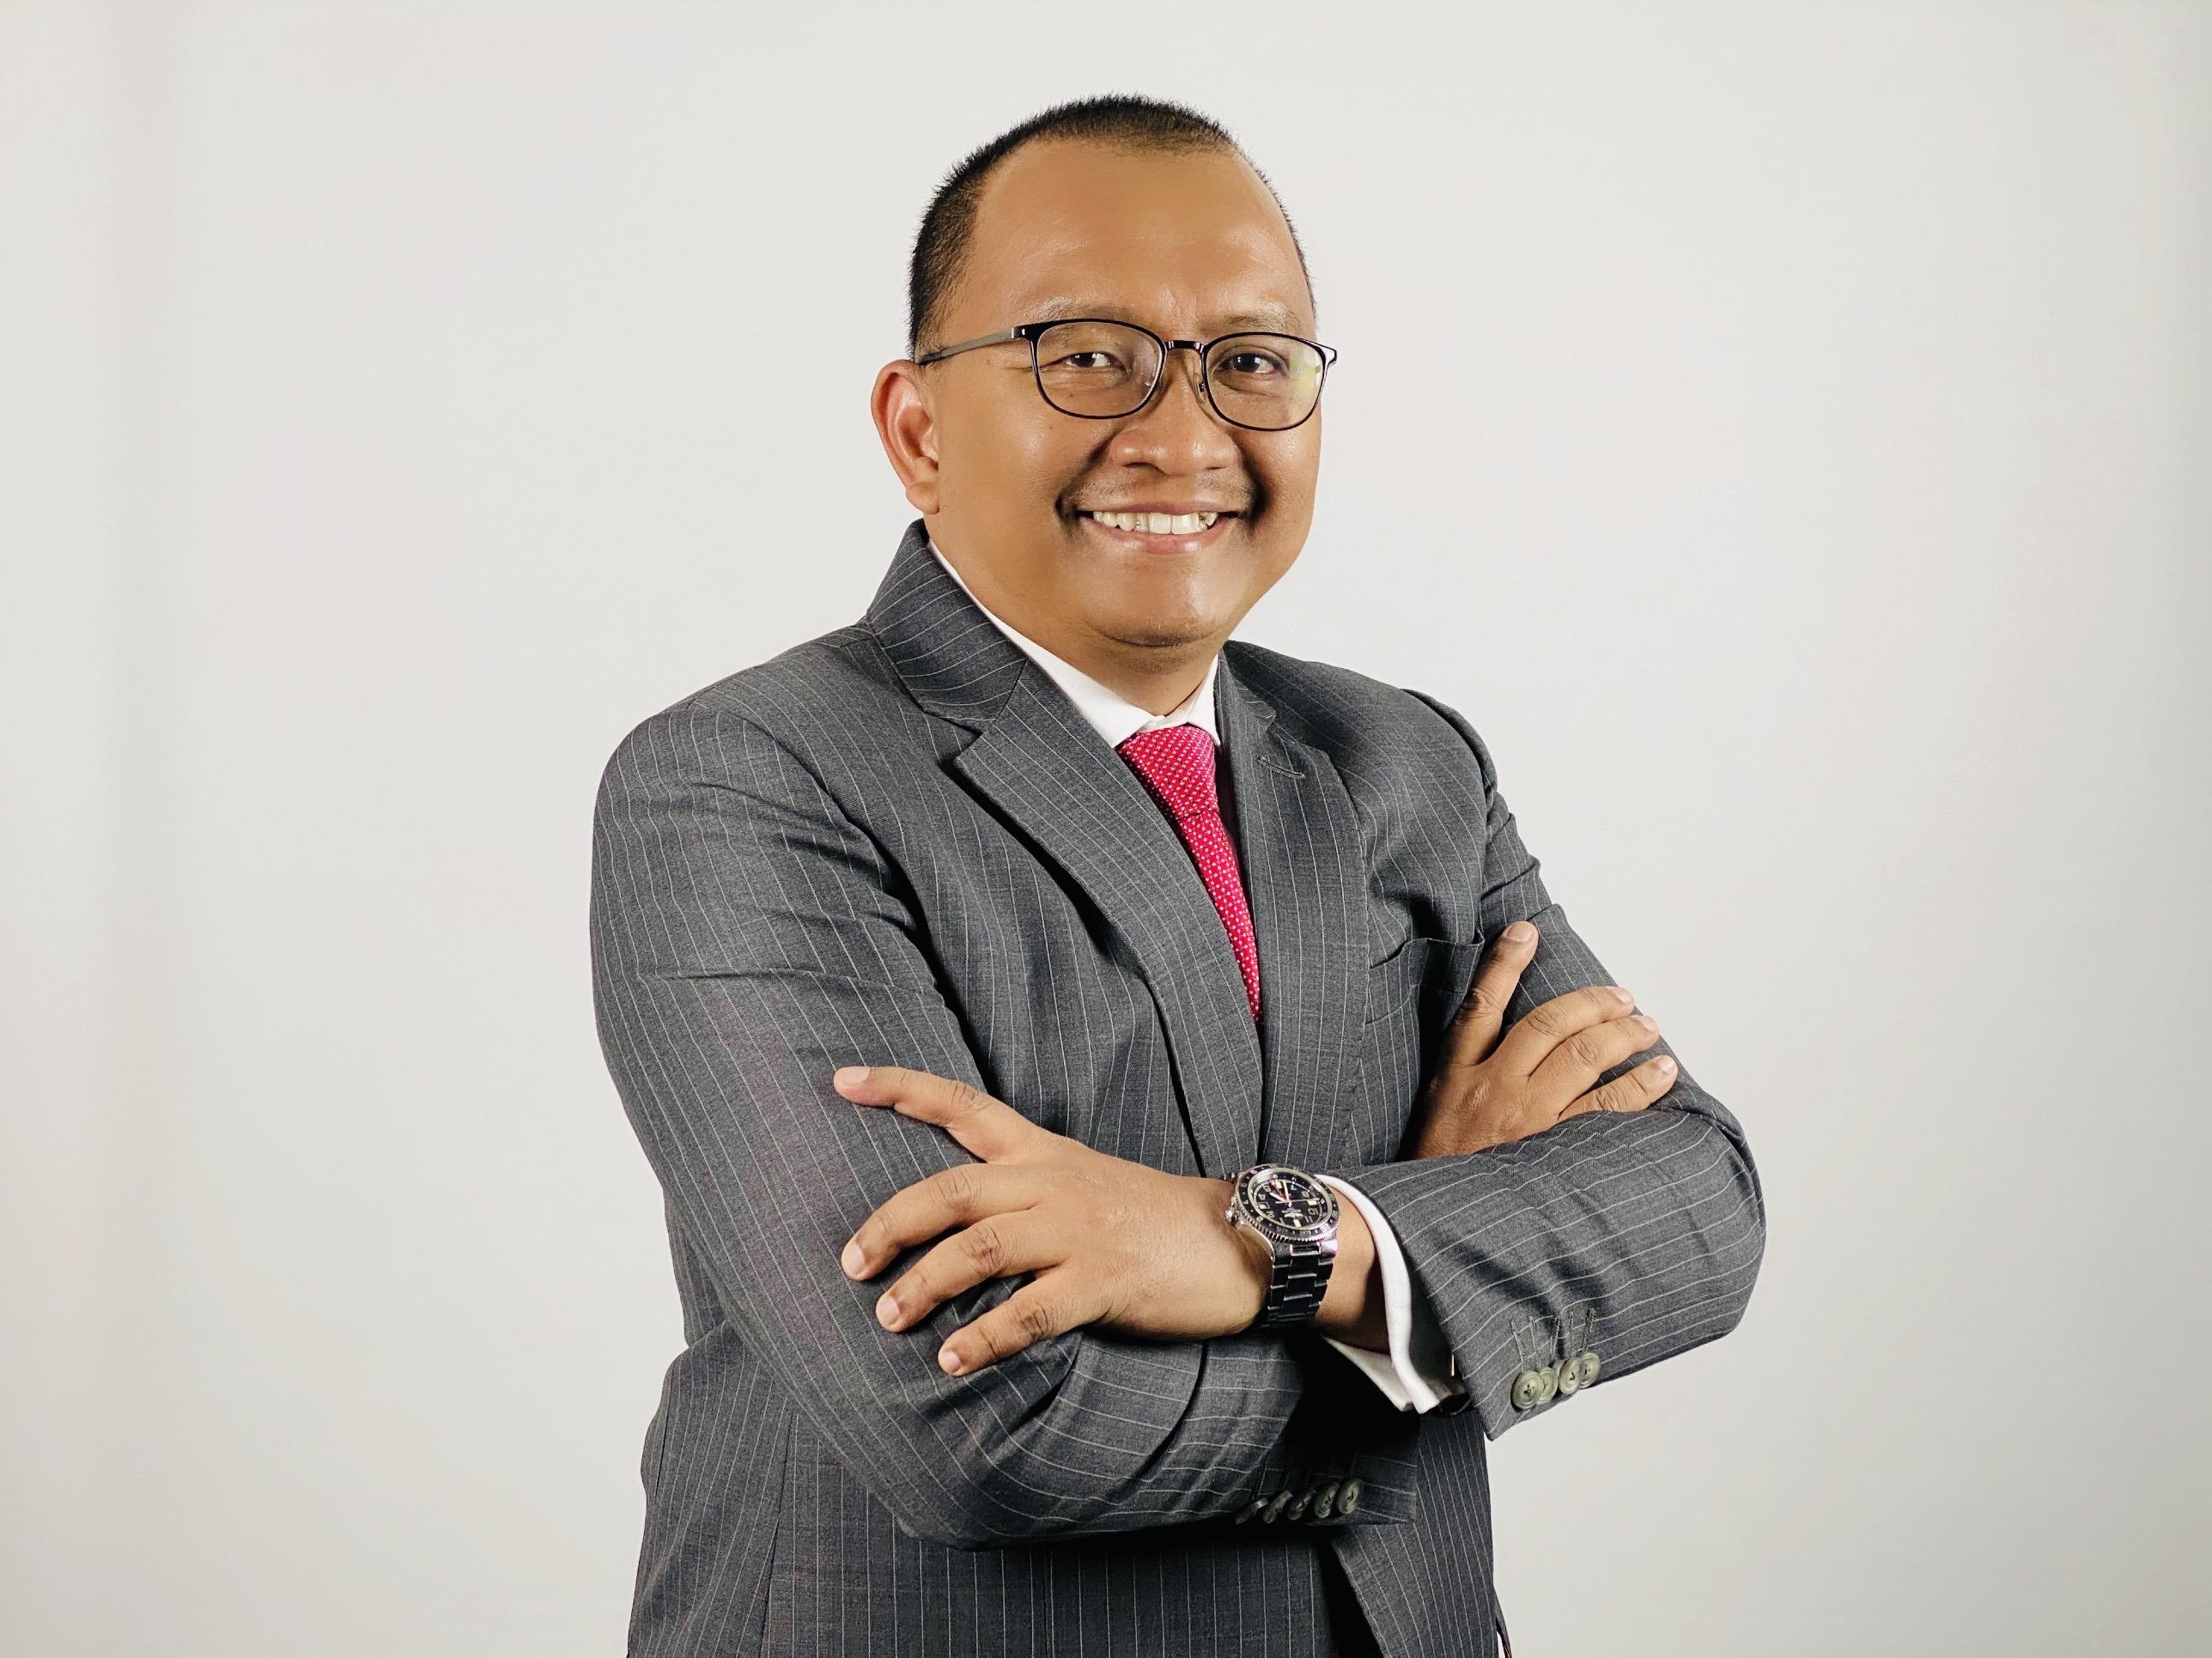 Ahmad Lutfi Abdull Mutalip